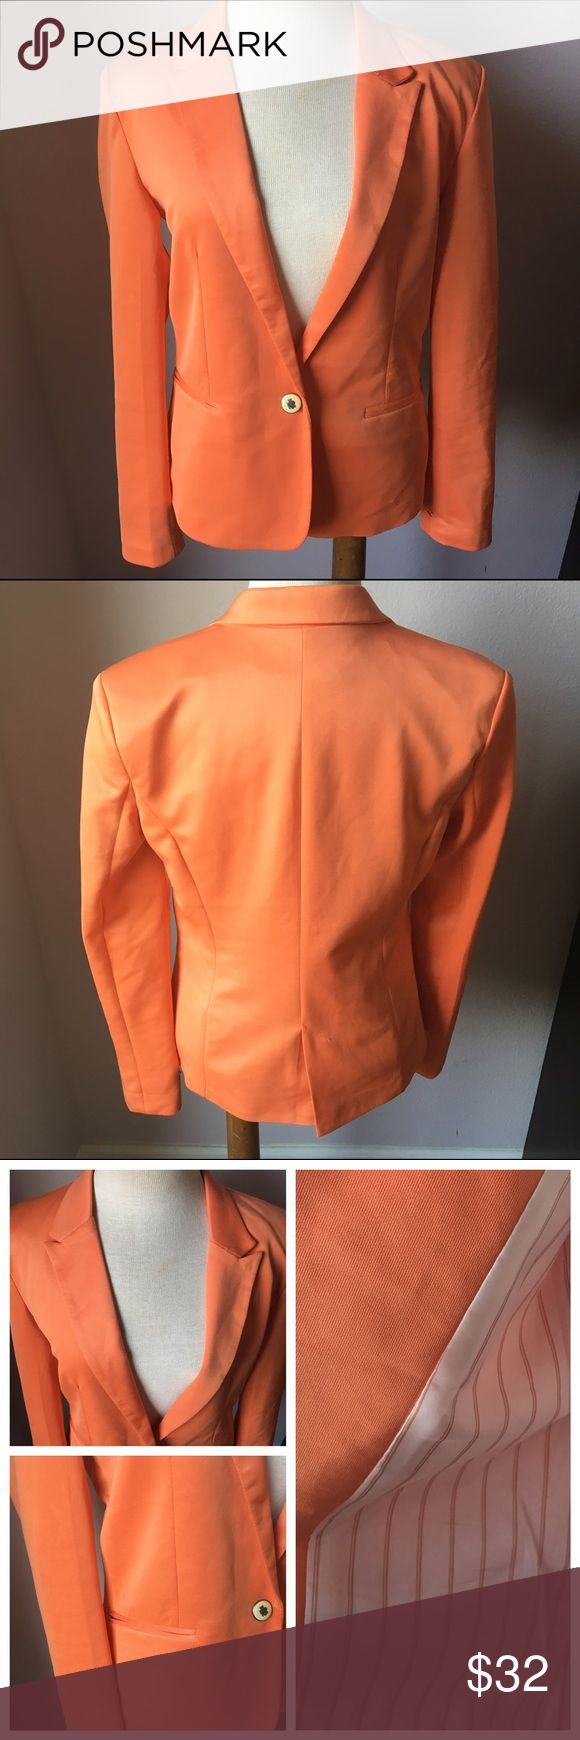 ZARA Basic Orange Lined Single Button Blazer Sz S Great condition. Super cute! Bundle & Save 😊 Zara Jackets & Coats Blazers